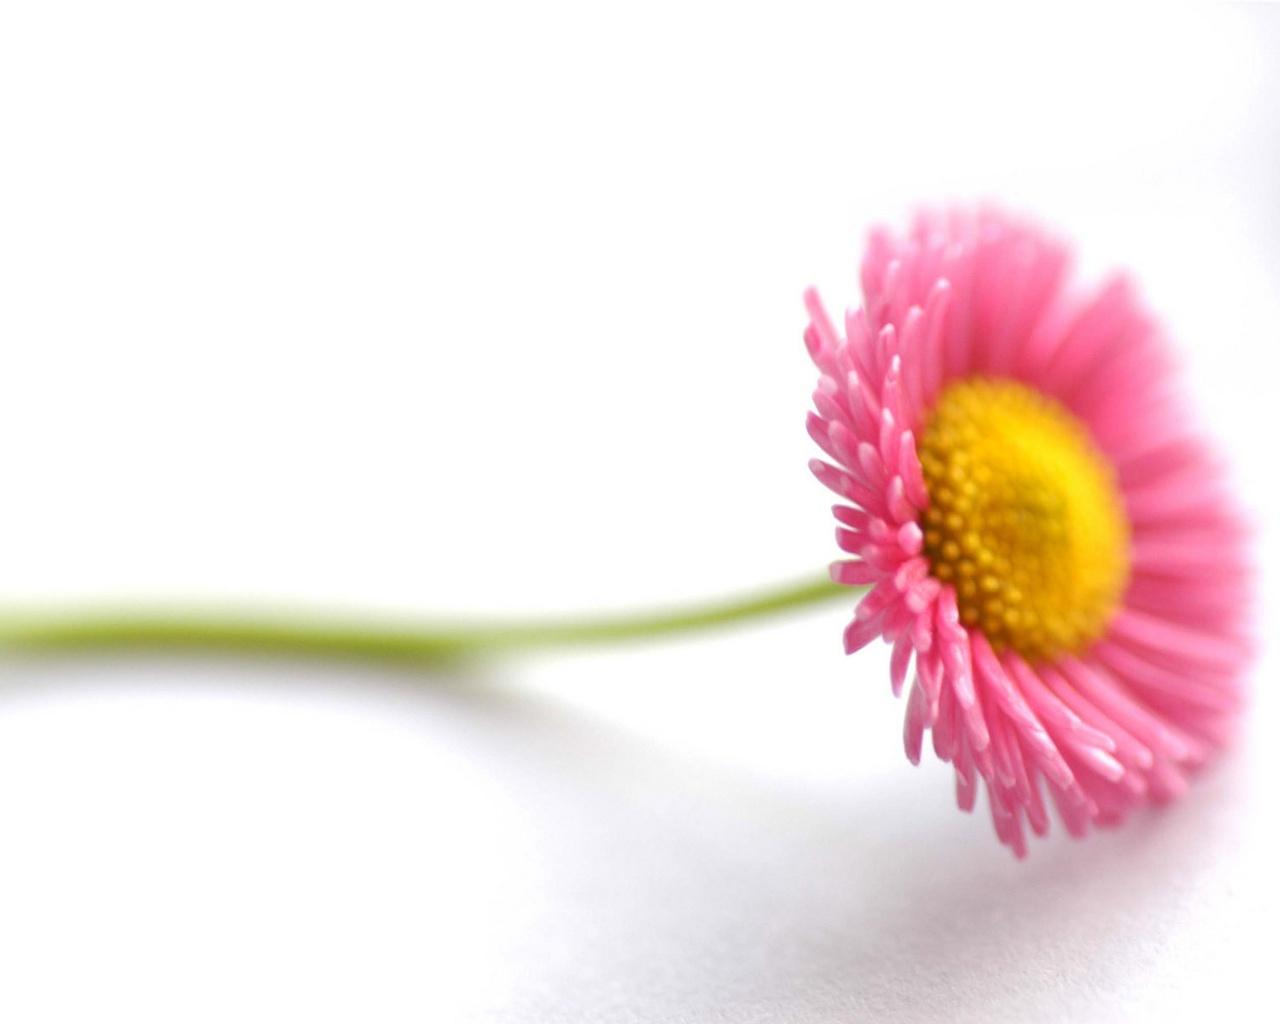 Beautiful flower wallpapers in jpg format for free download beautiful flower wallpapers izmirmasajfo